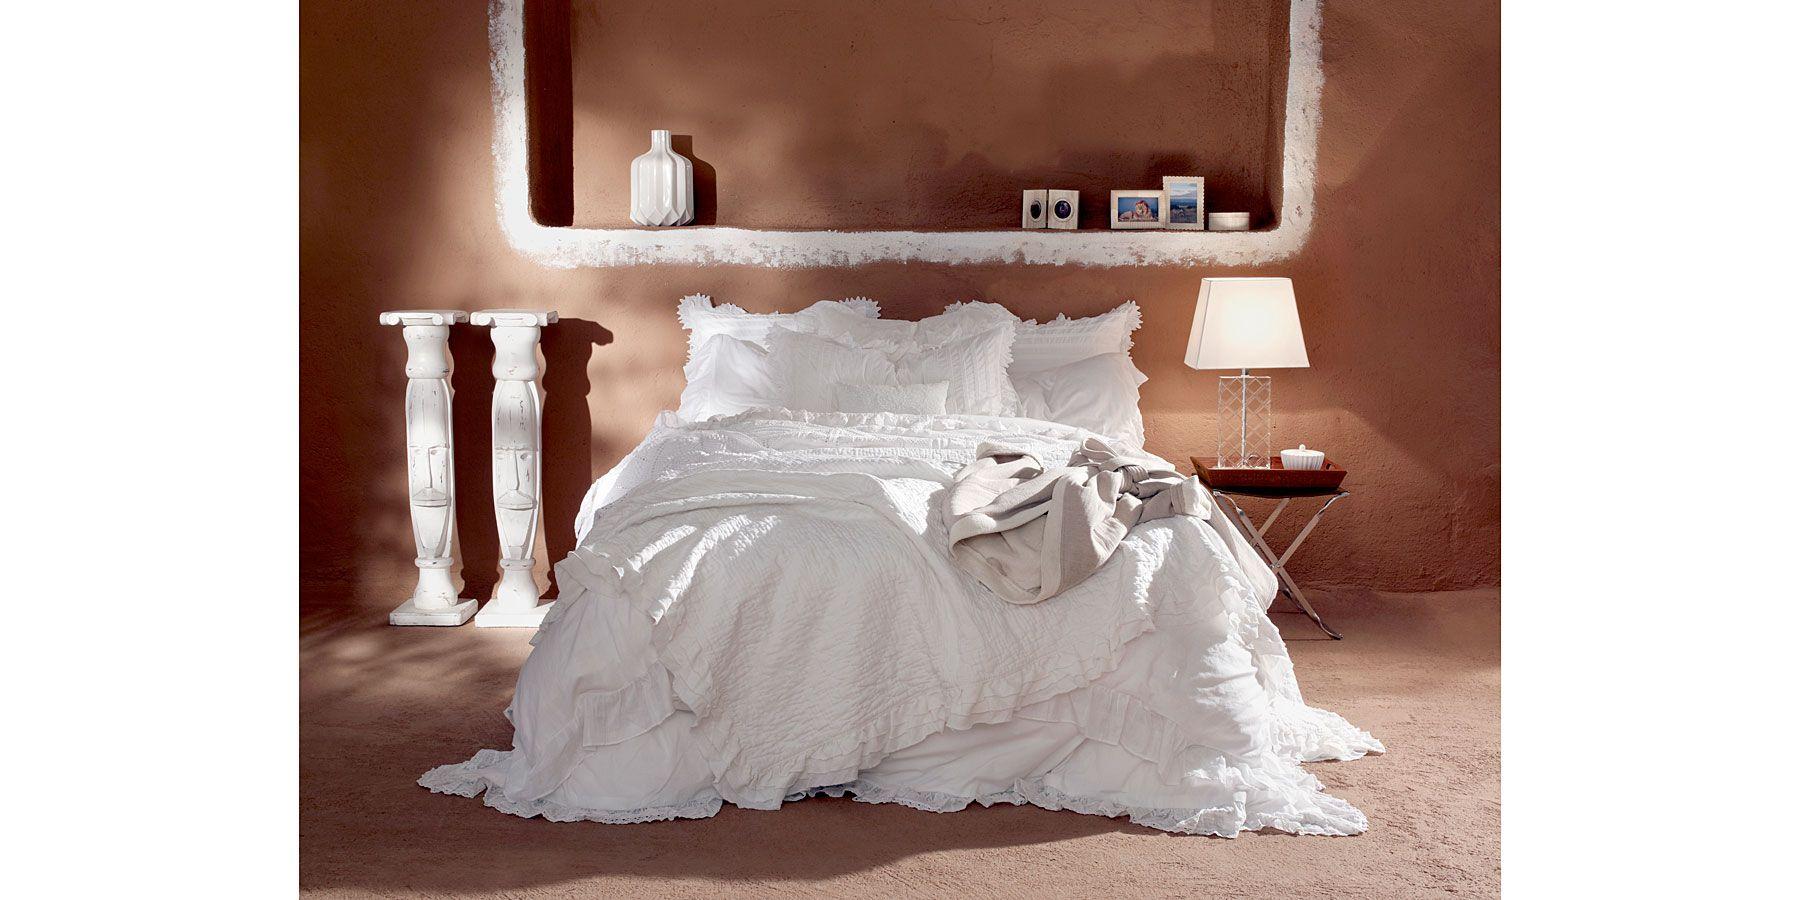 fantastic lamp and bedside table   Bedroom Ideas   Pinterest ...